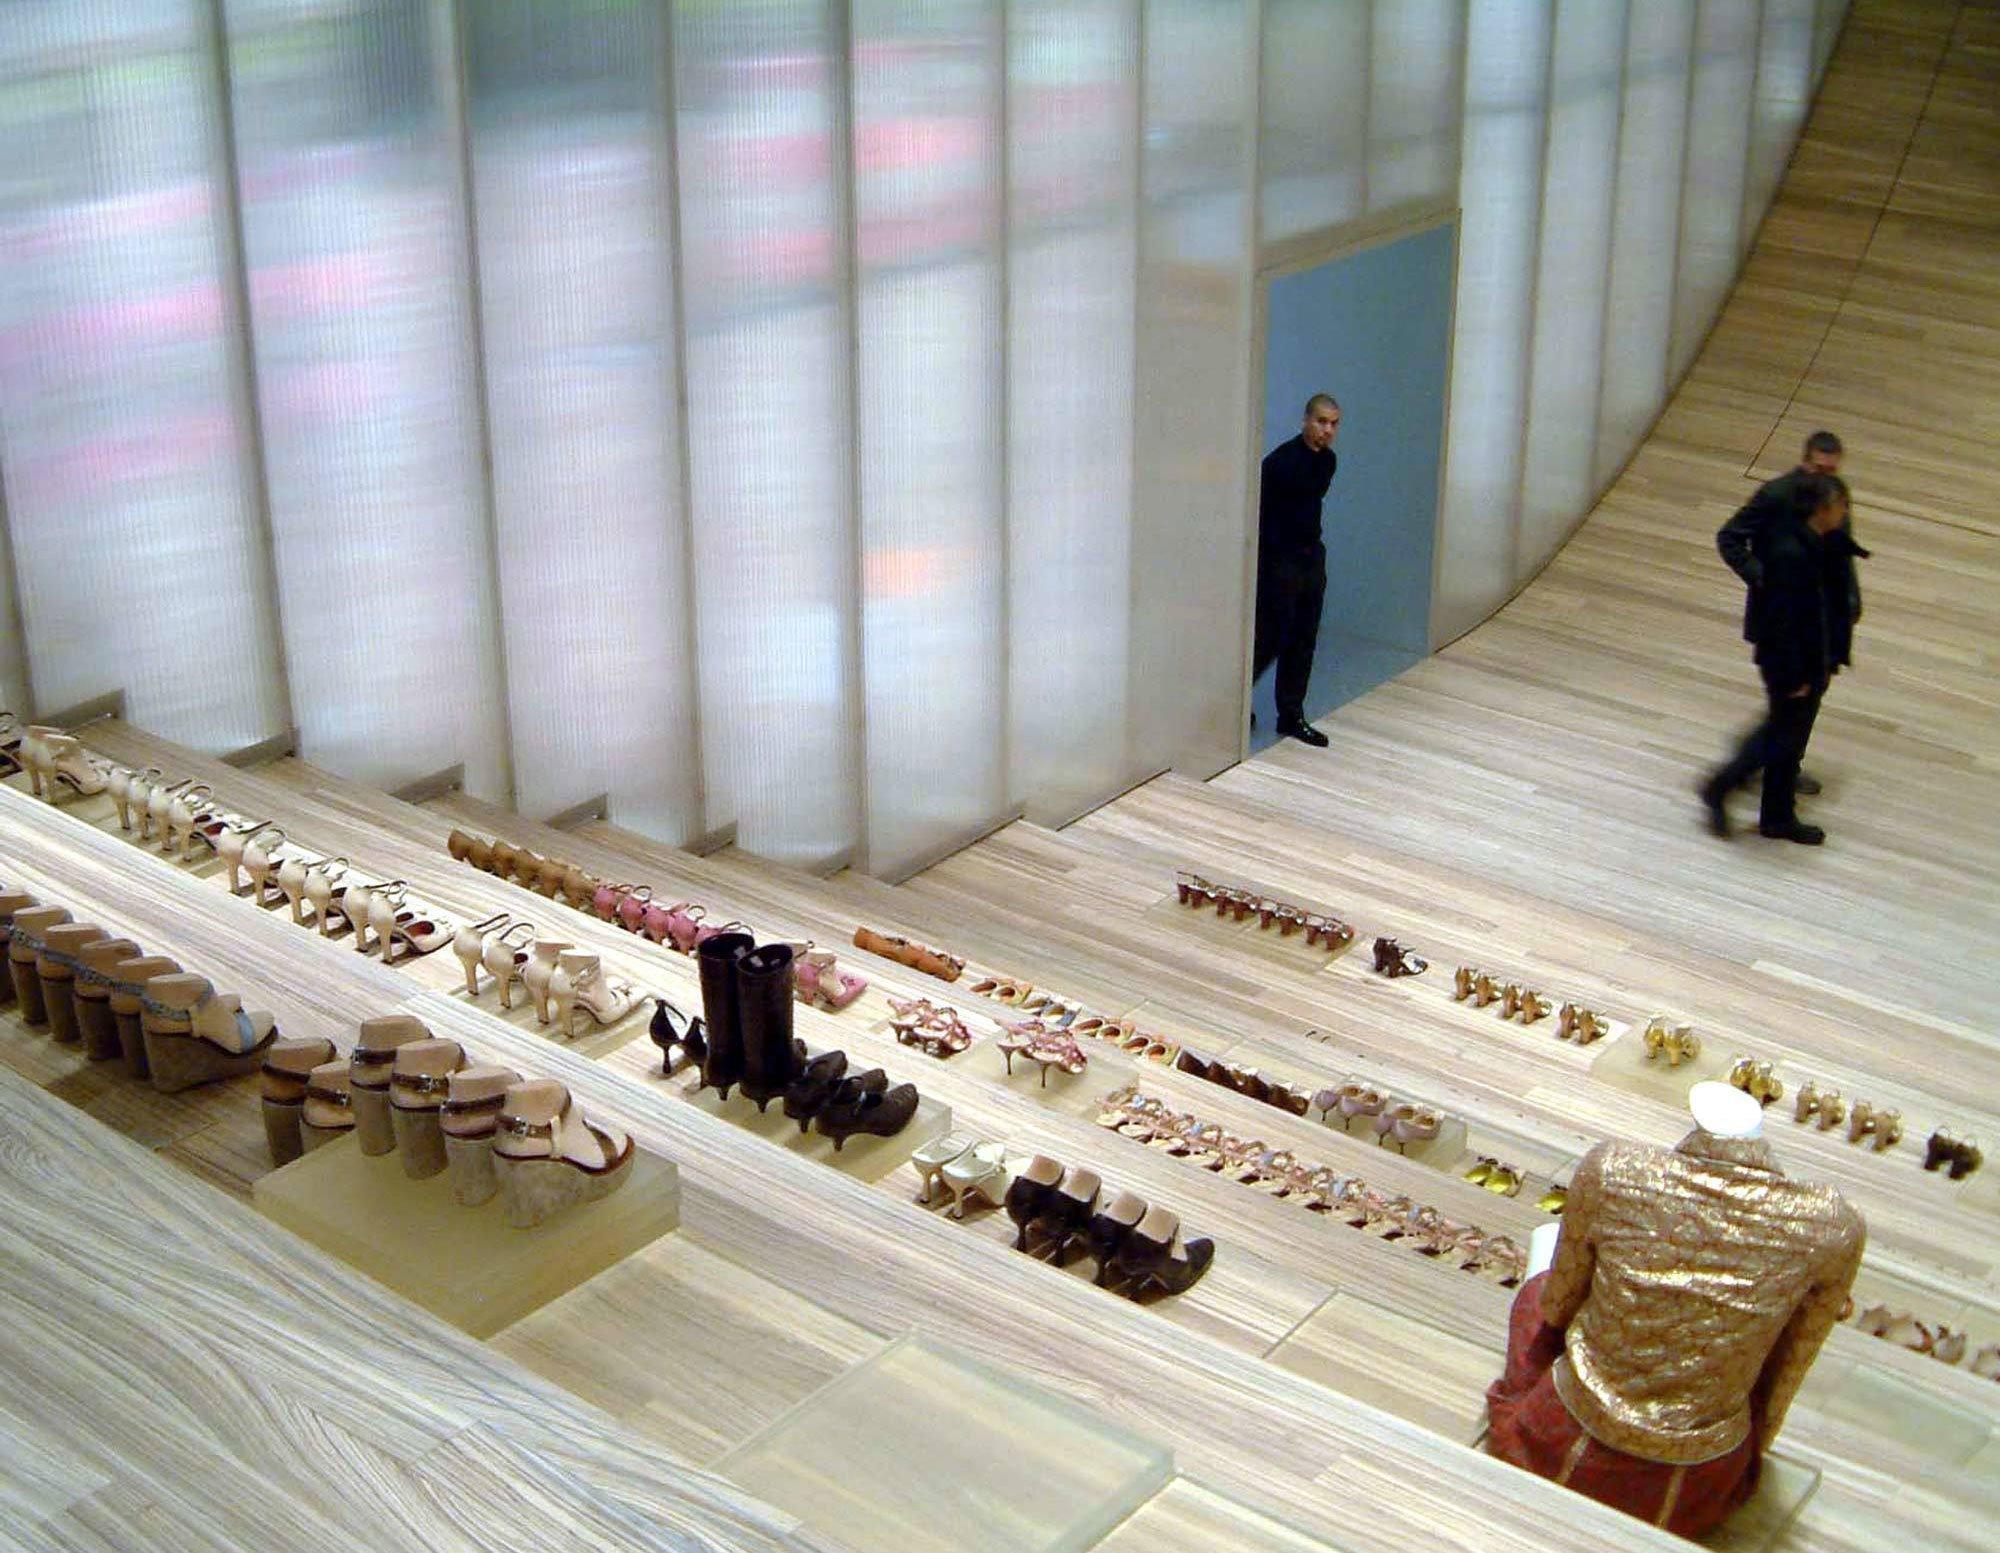 Prada Epicenter New York, OMA, 2000-2001, Foto: Copyright OMA